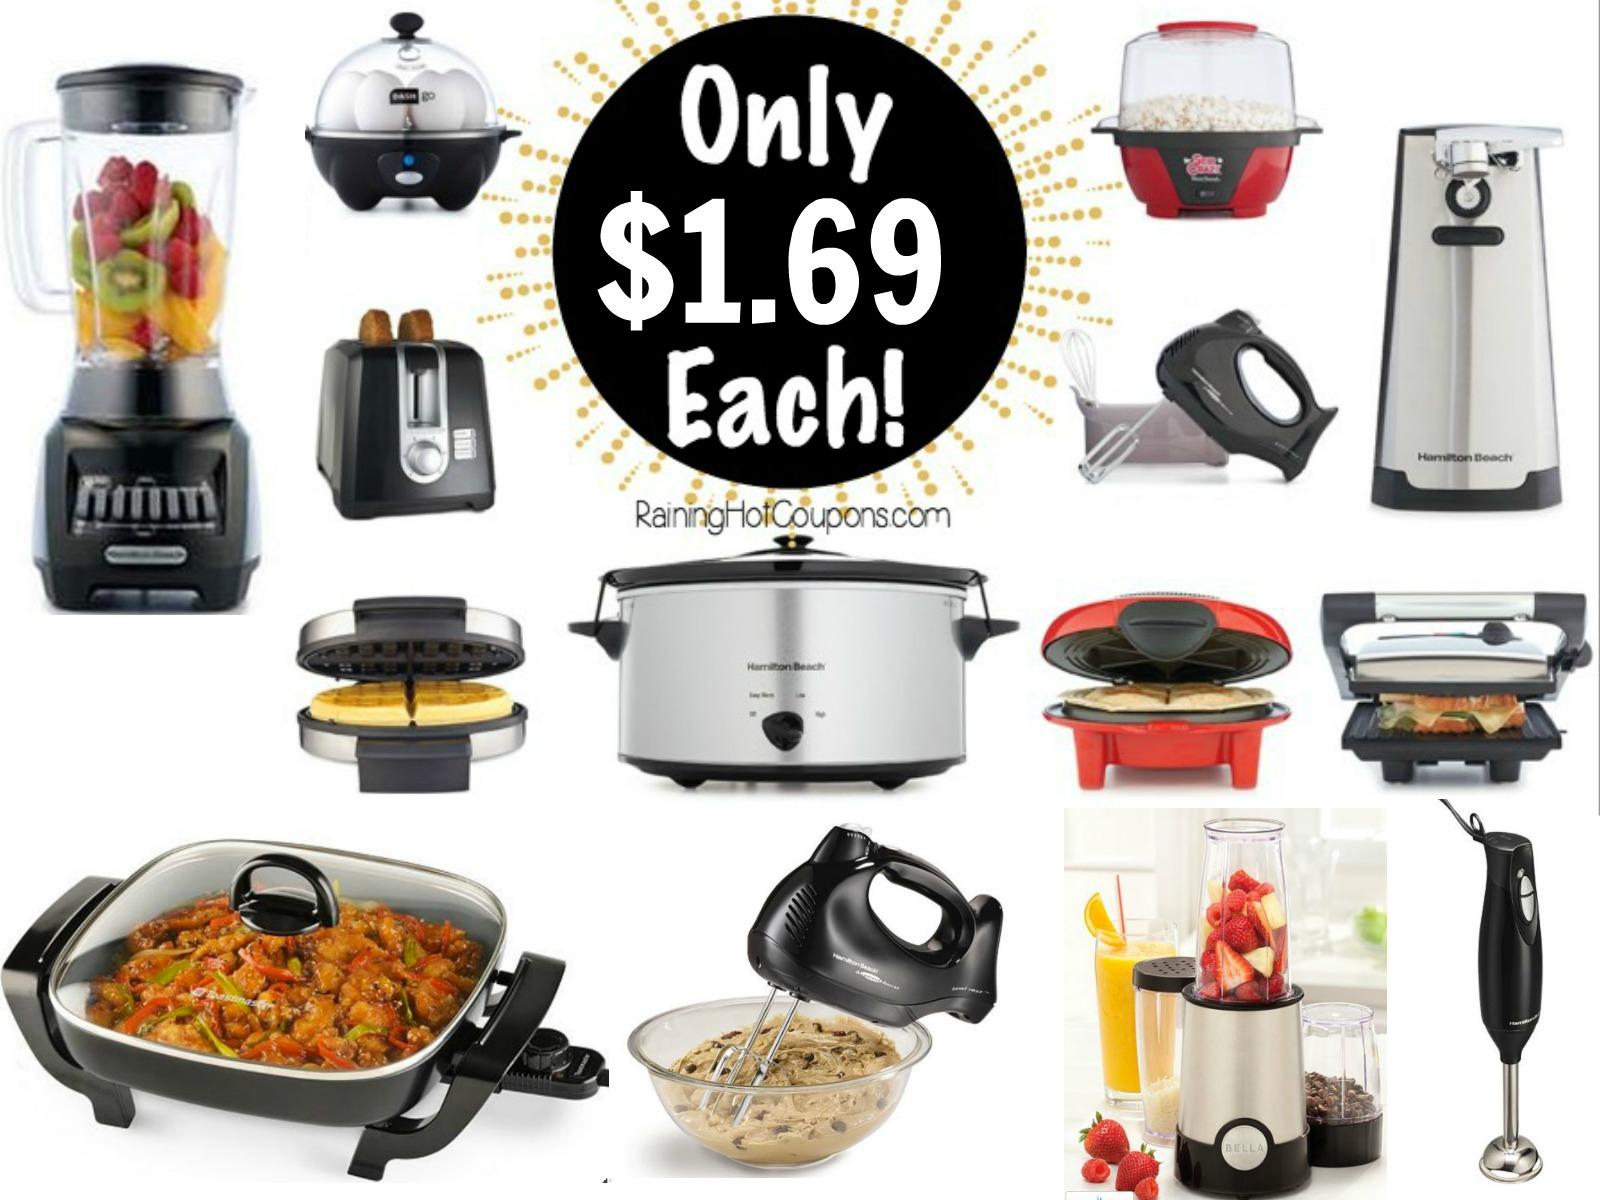 Hot Kohl S 6 Kitchen Appliances Only 1 69 Each 239